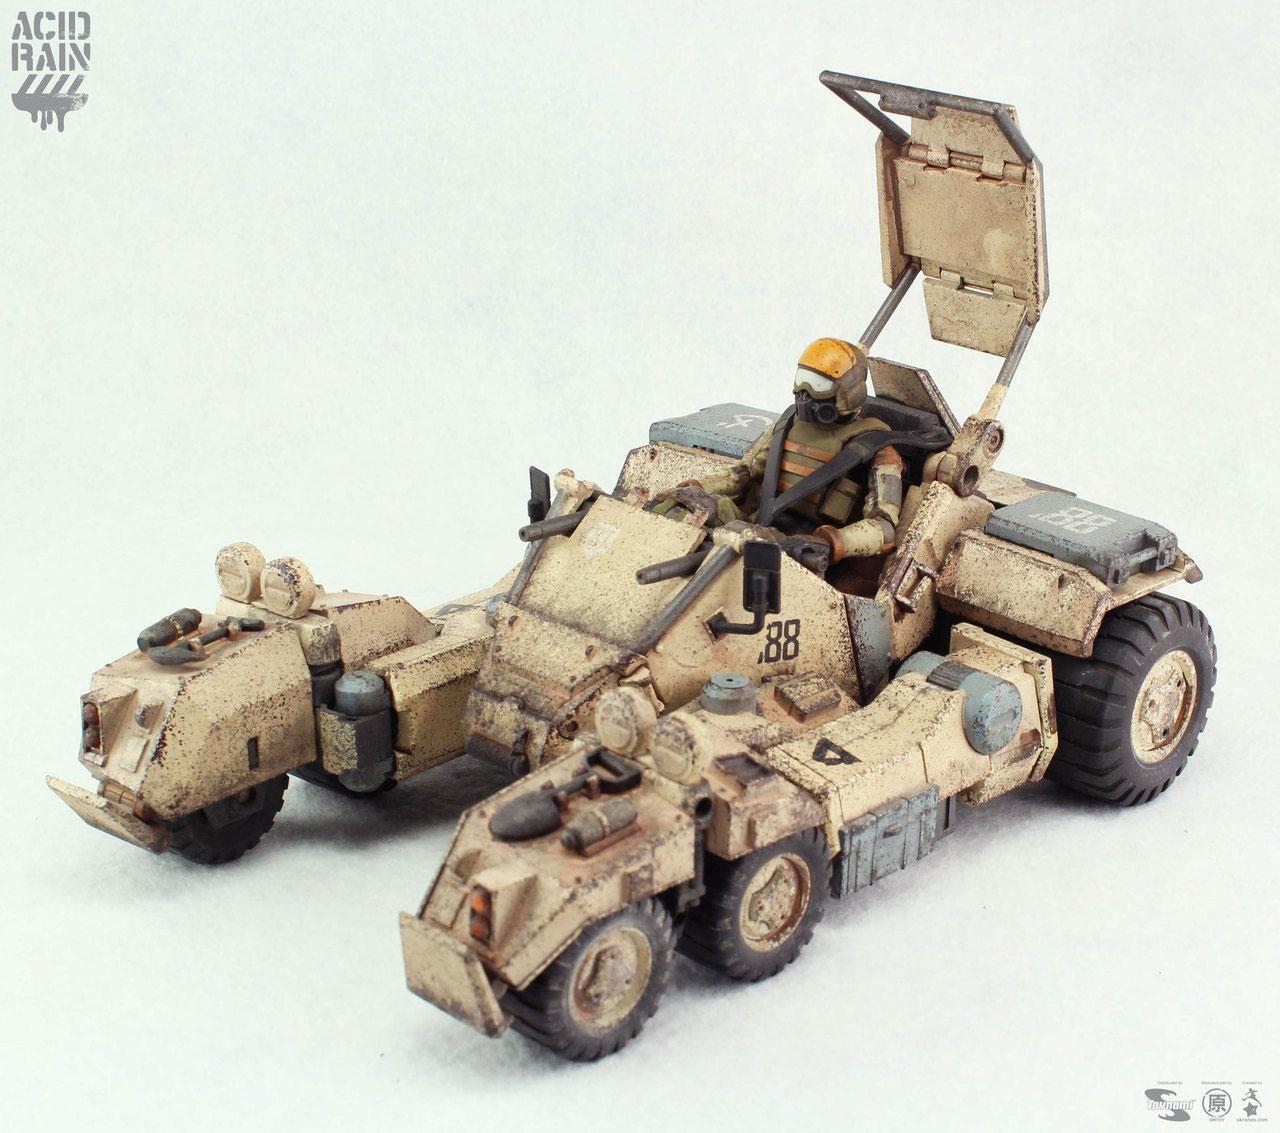 Acid Rain Transforming Mecha Action Vehicle with Mini Figure 1/18 Speeder MK.II (Sand) 23 cm